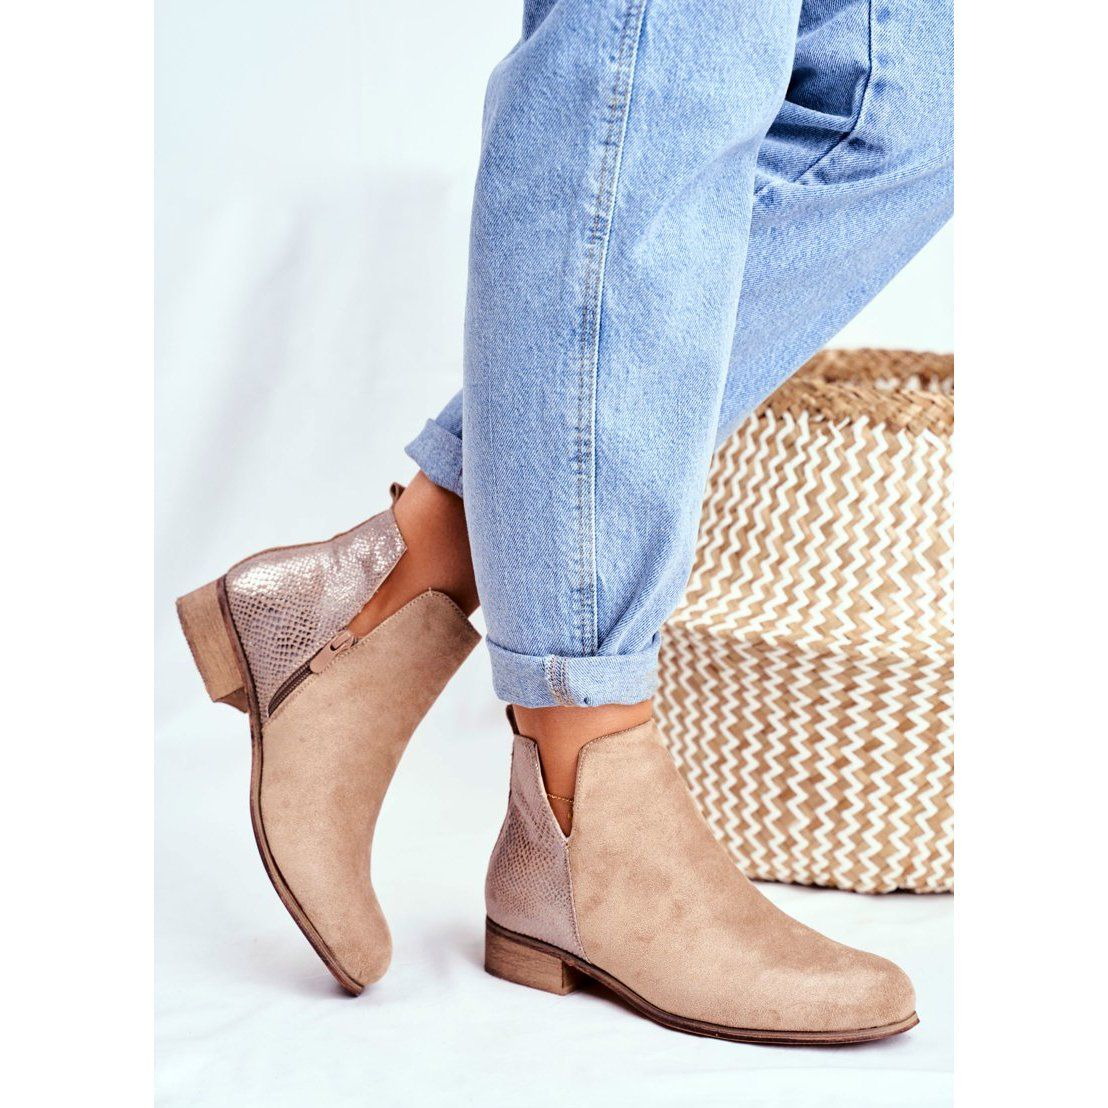 Eve Botki Damskie Plaski Obcas Wiosenne Khaki Viva Bezowy Ankle Boot Shoes Boots